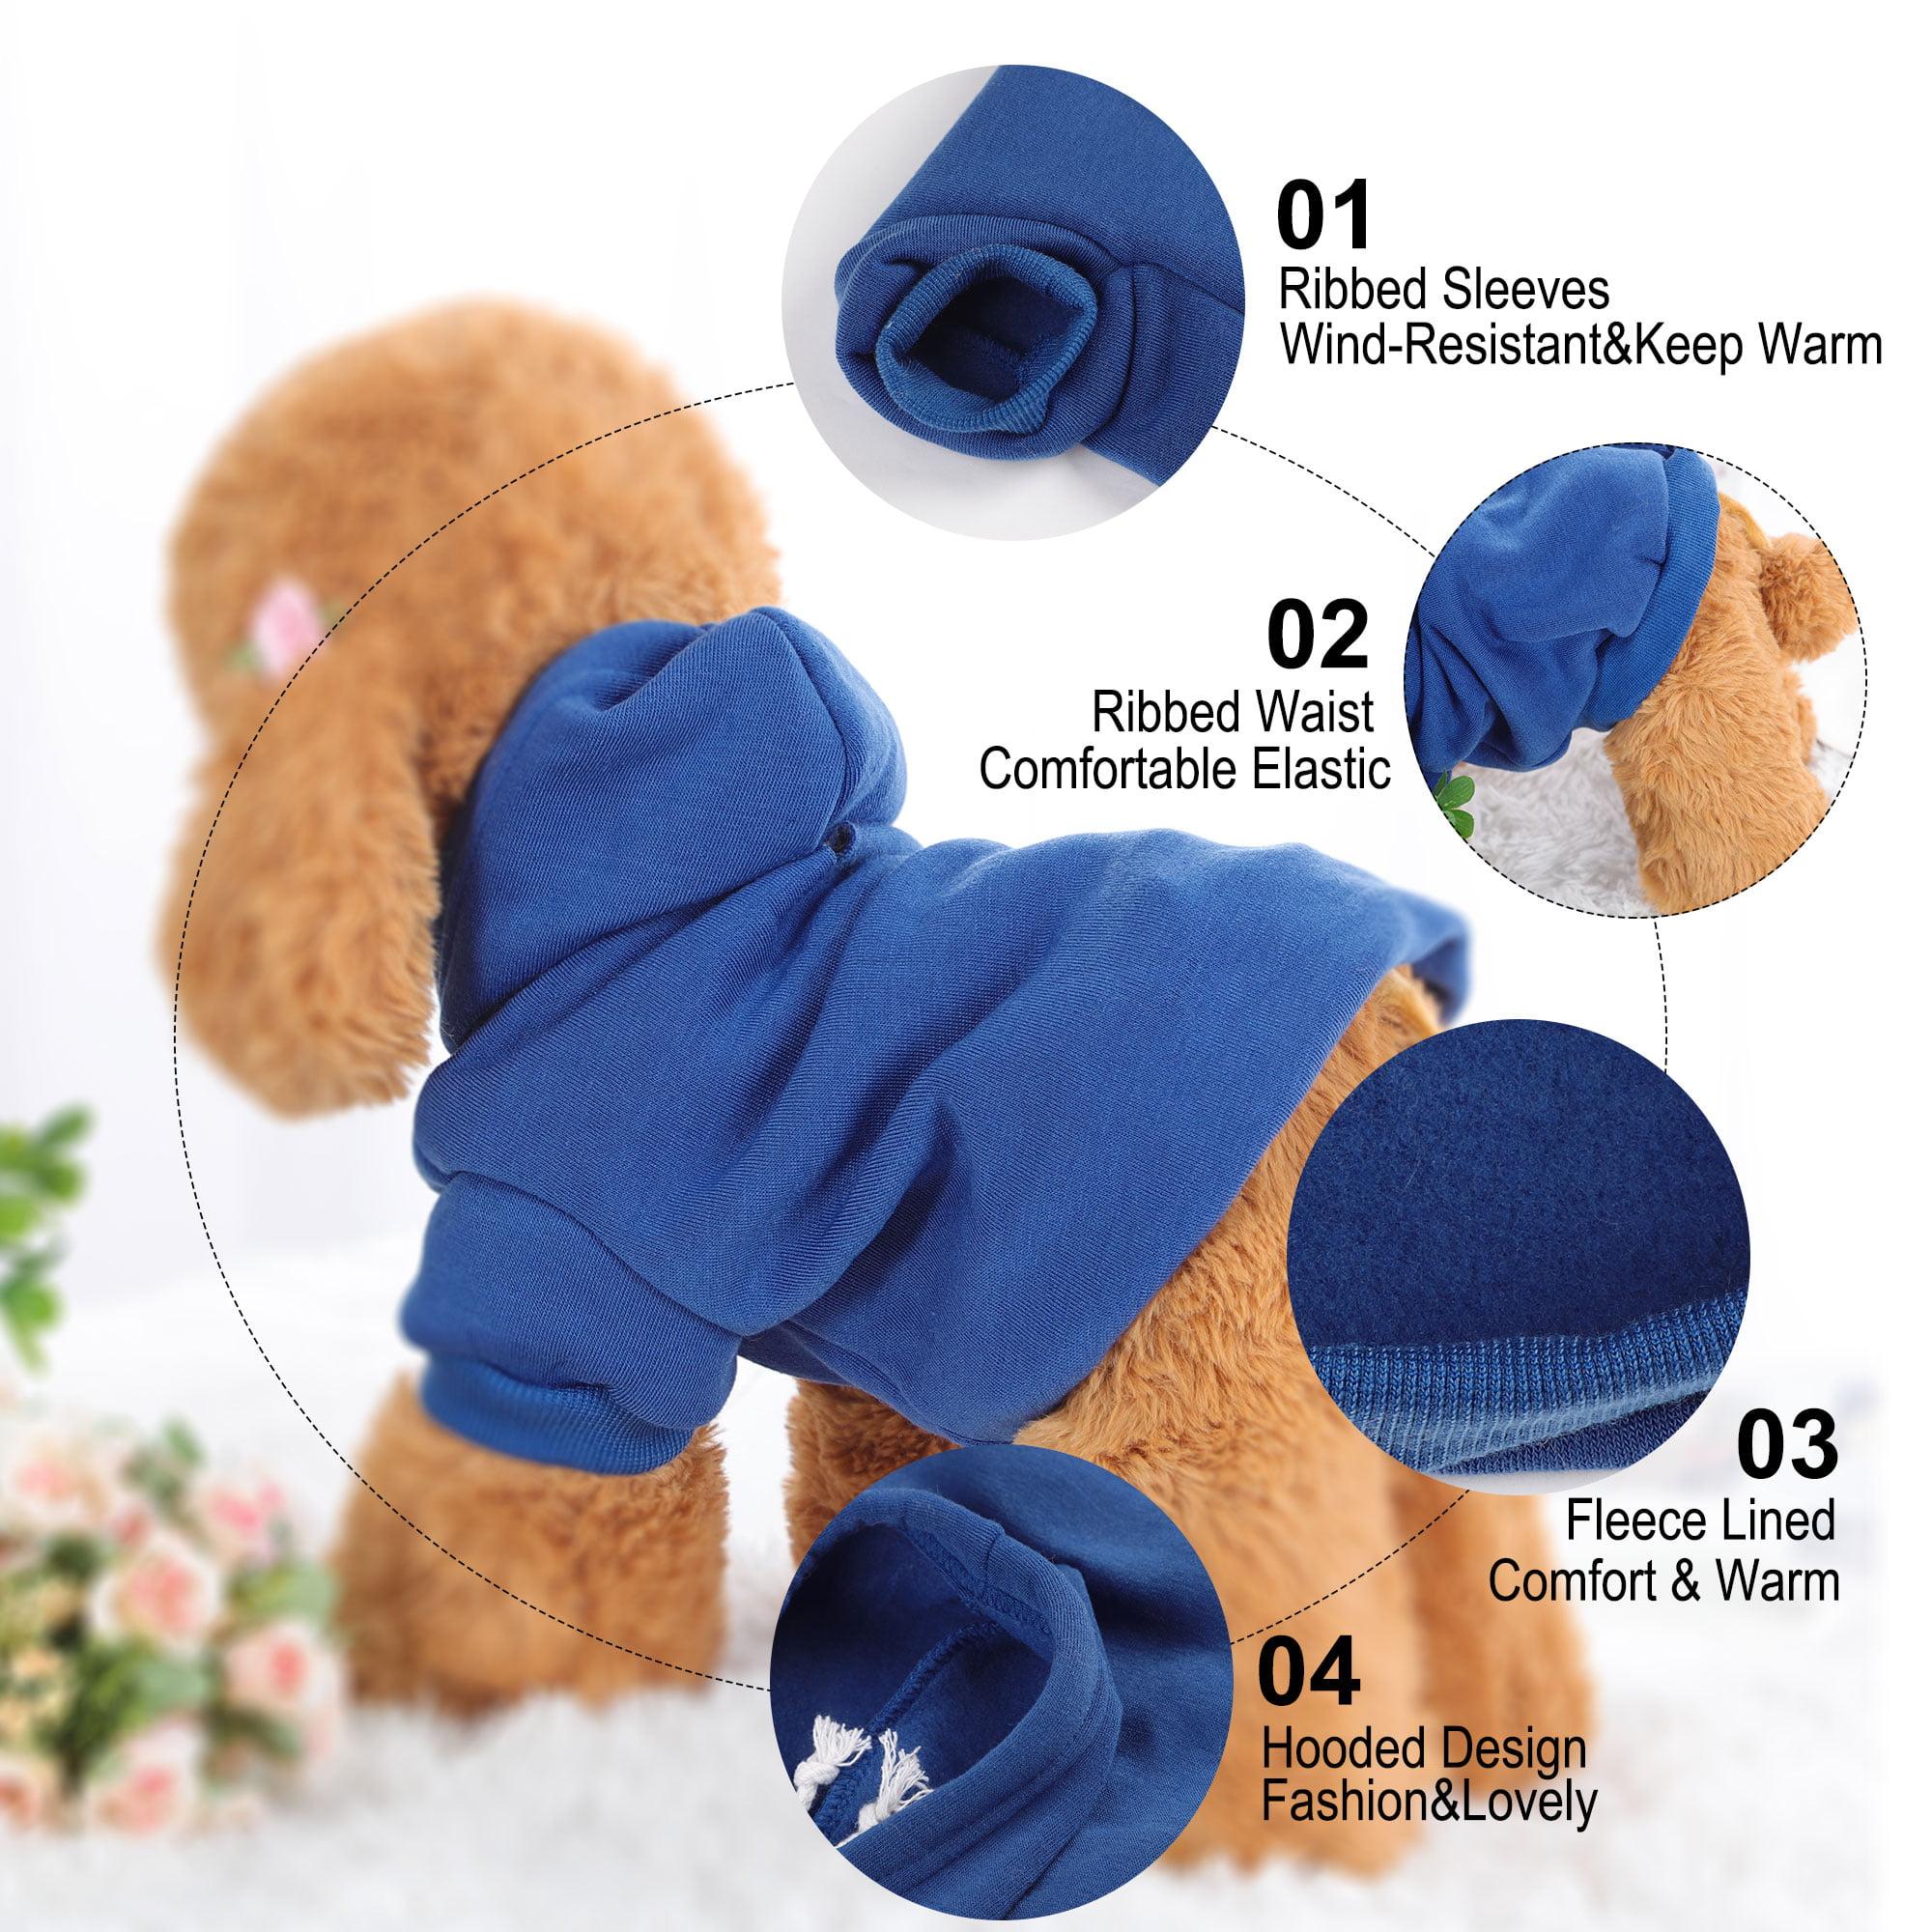 Cotton Dog Winter/Spring/Fall Sweatshirt Hoody Pet Clothes Warm Coat Blue M - image 6 of 7